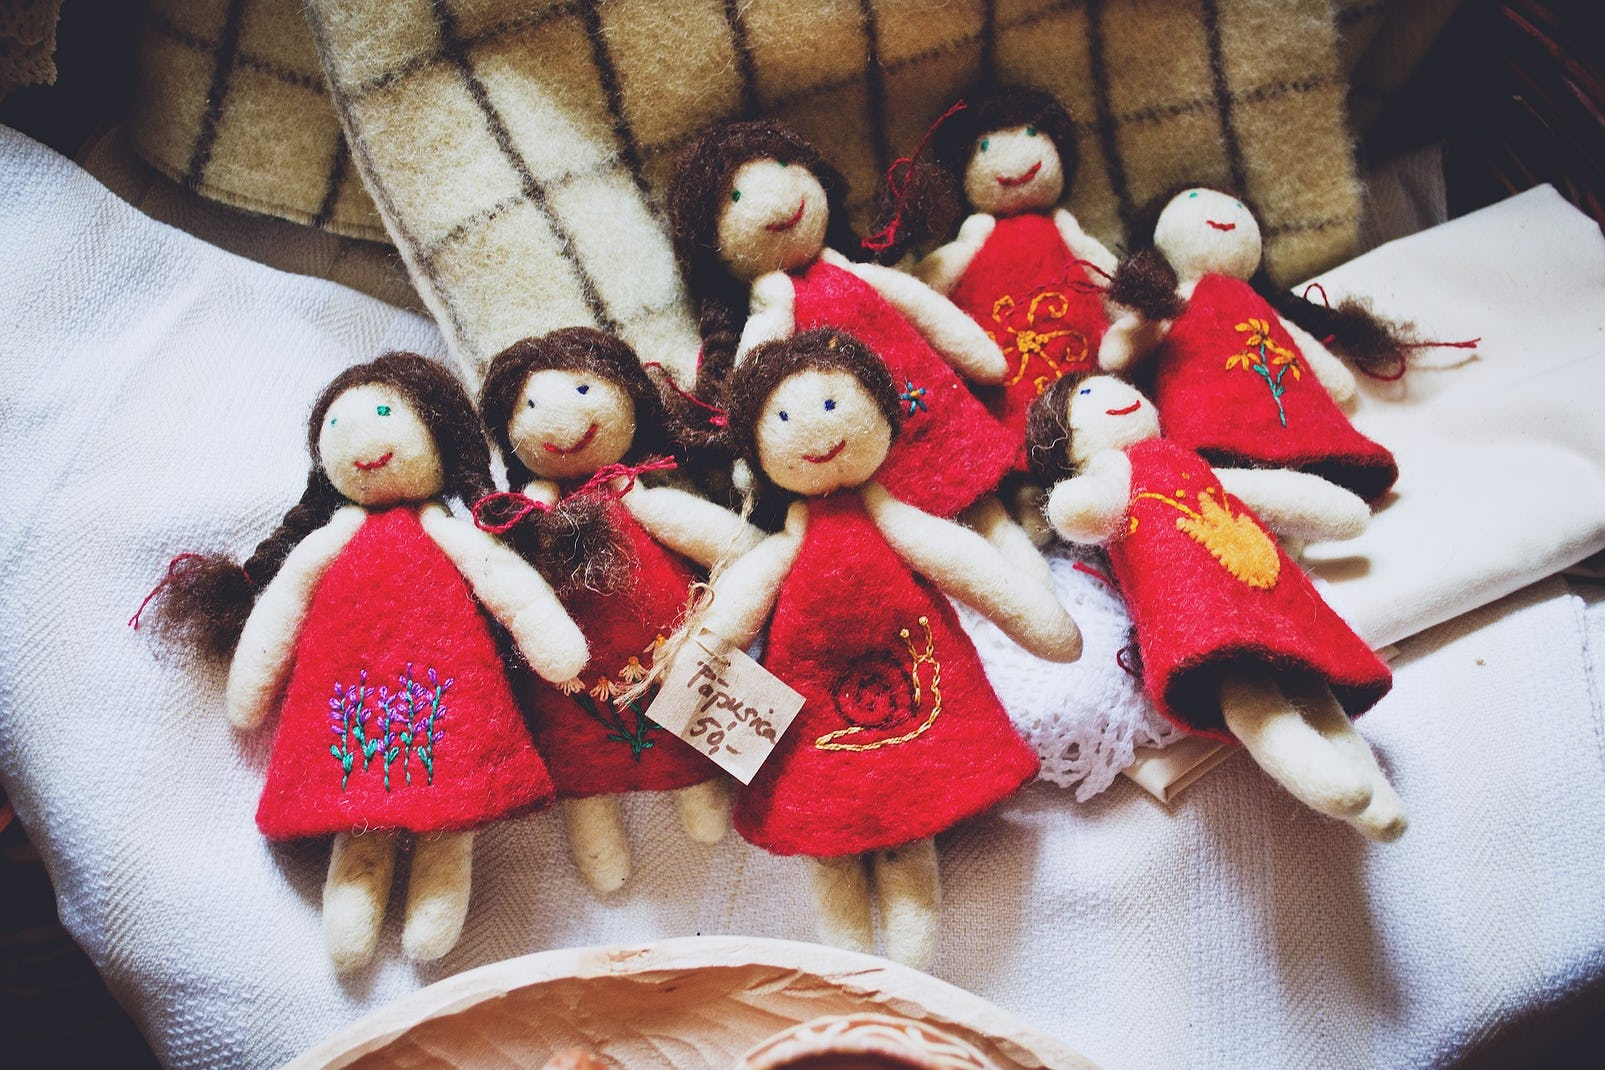 Handmade dolls traditional from Transylvania